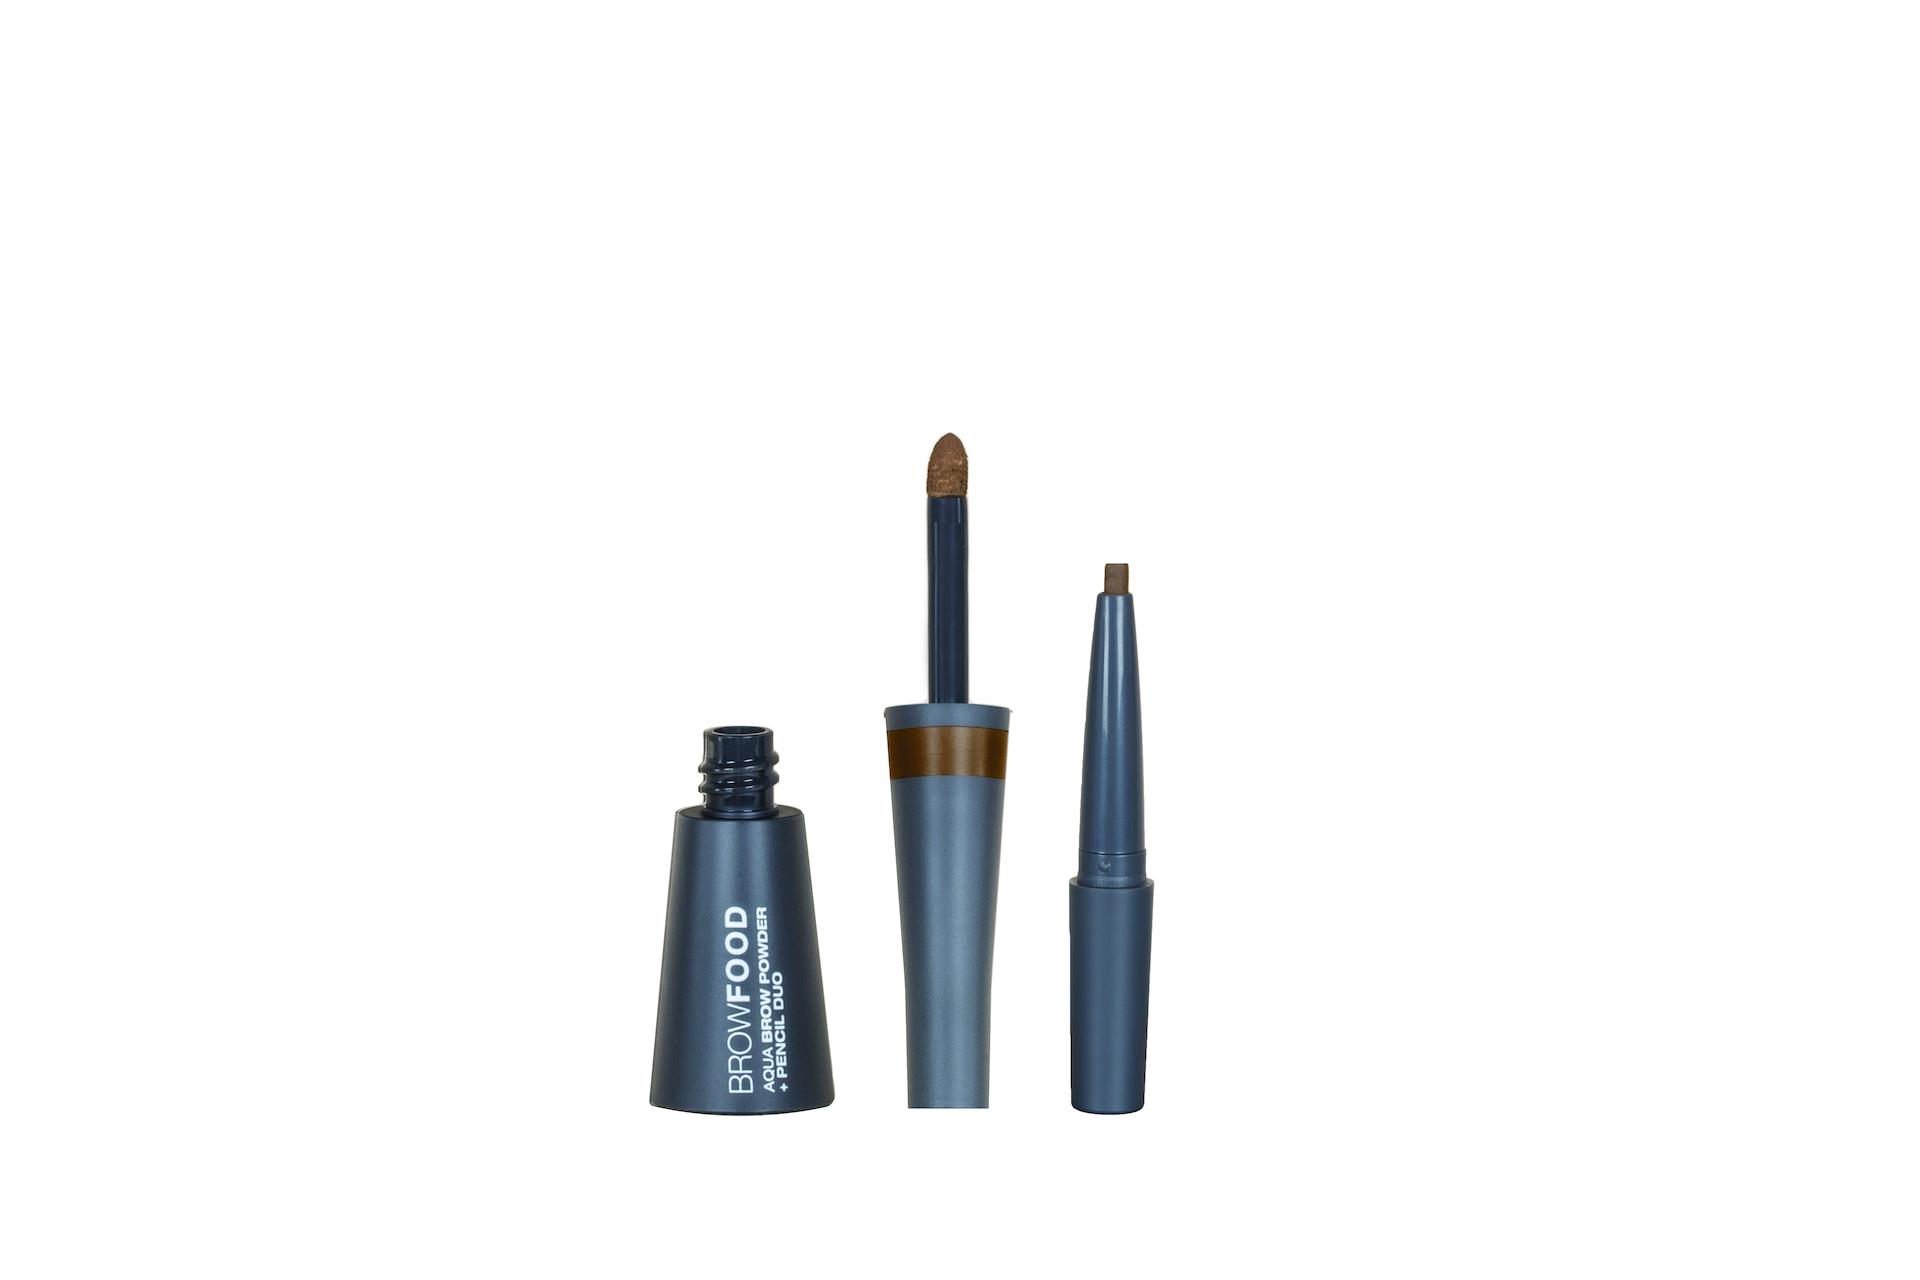 BrowFood Aqua Brow Powder + Pencil Duo Brunette